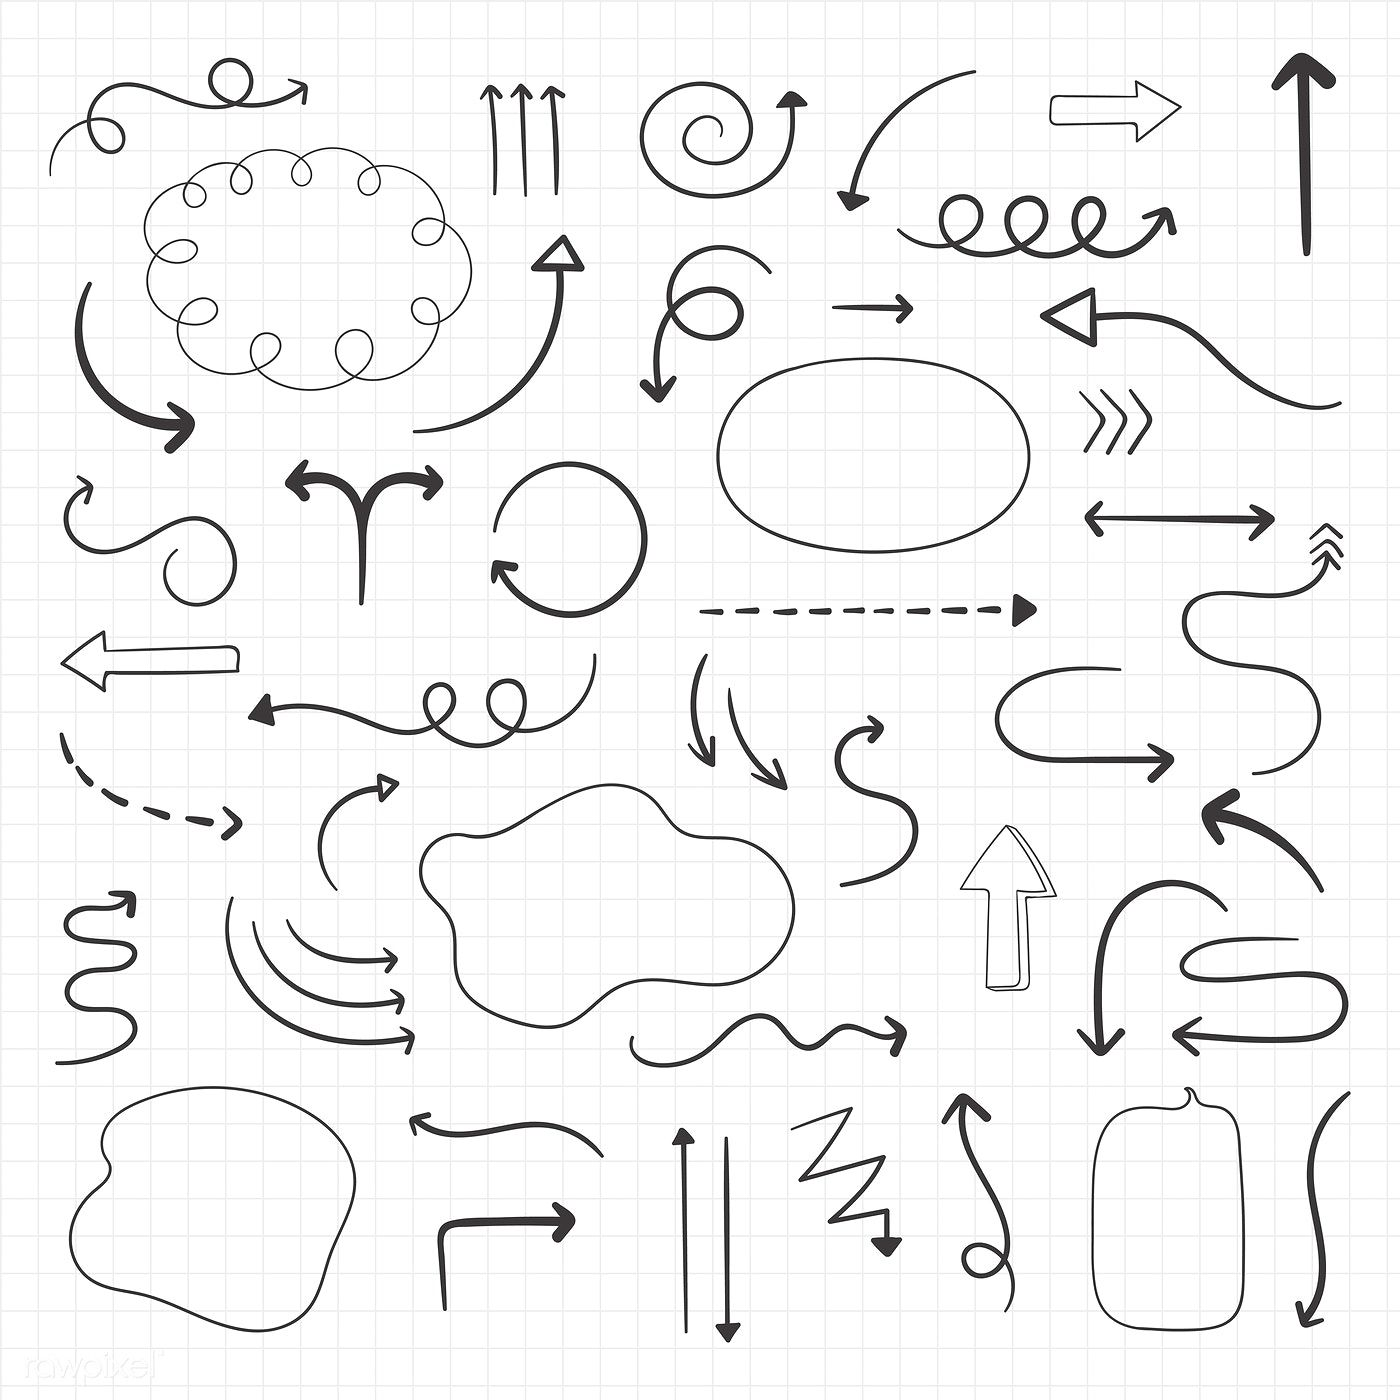 Download premium vector of Arrow and speech bubble doodle